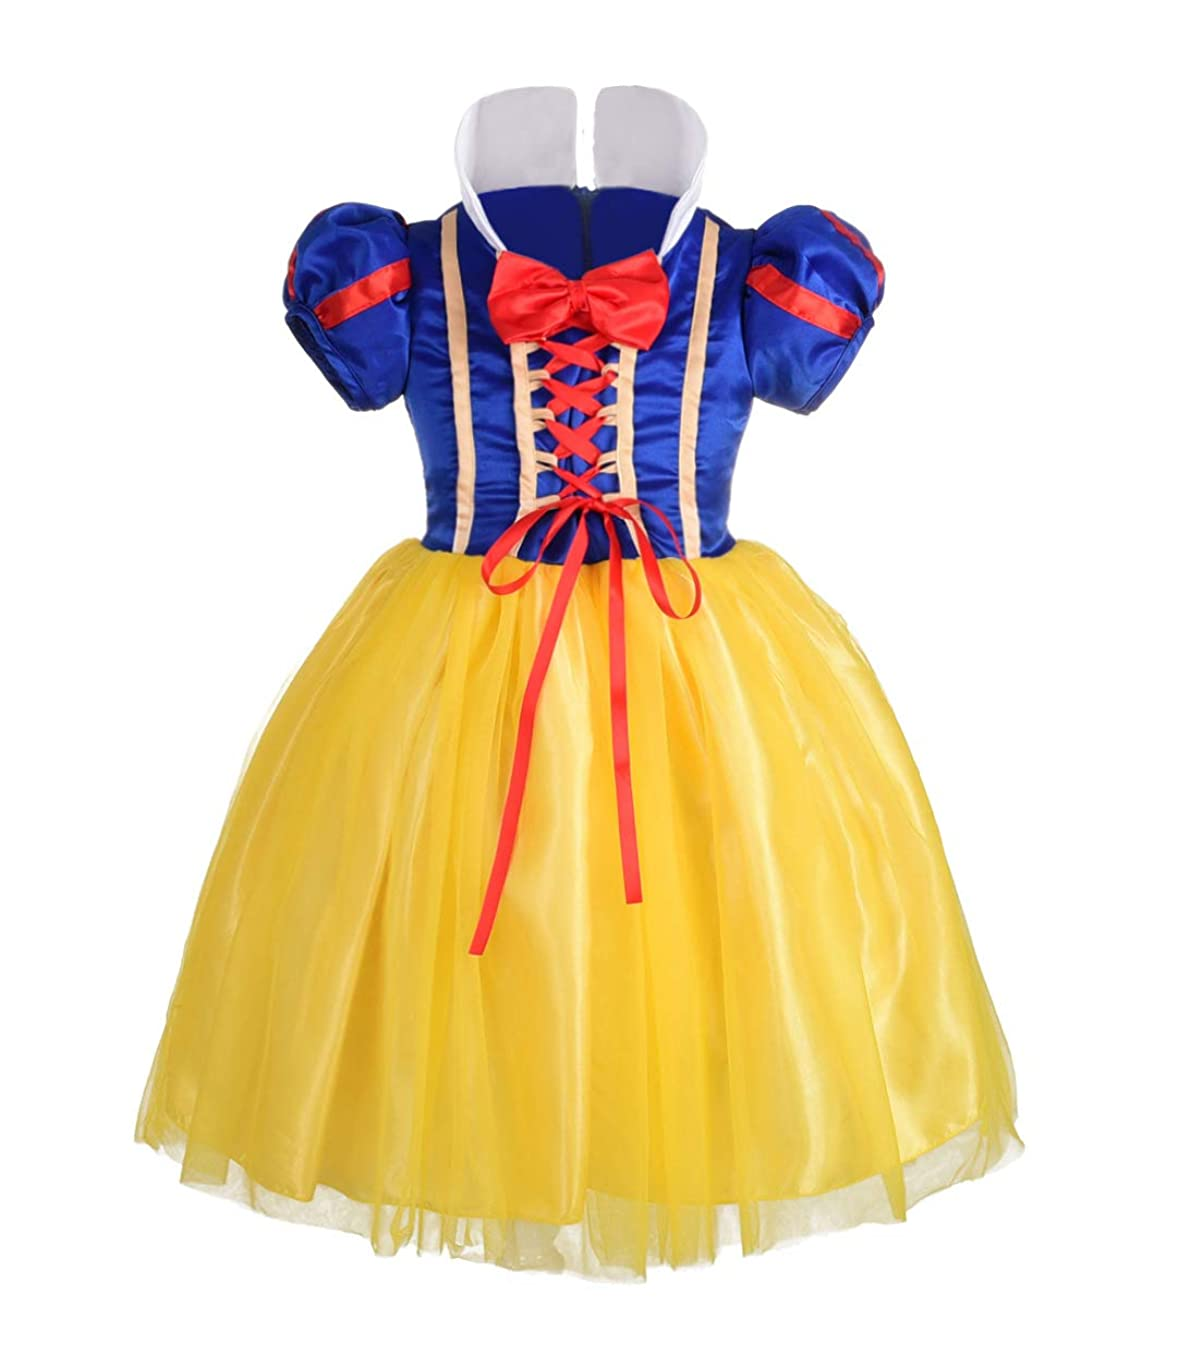 Dressy Daisy Girls' Princess Snow White Costume Fancy Dresses Up Halloween Party